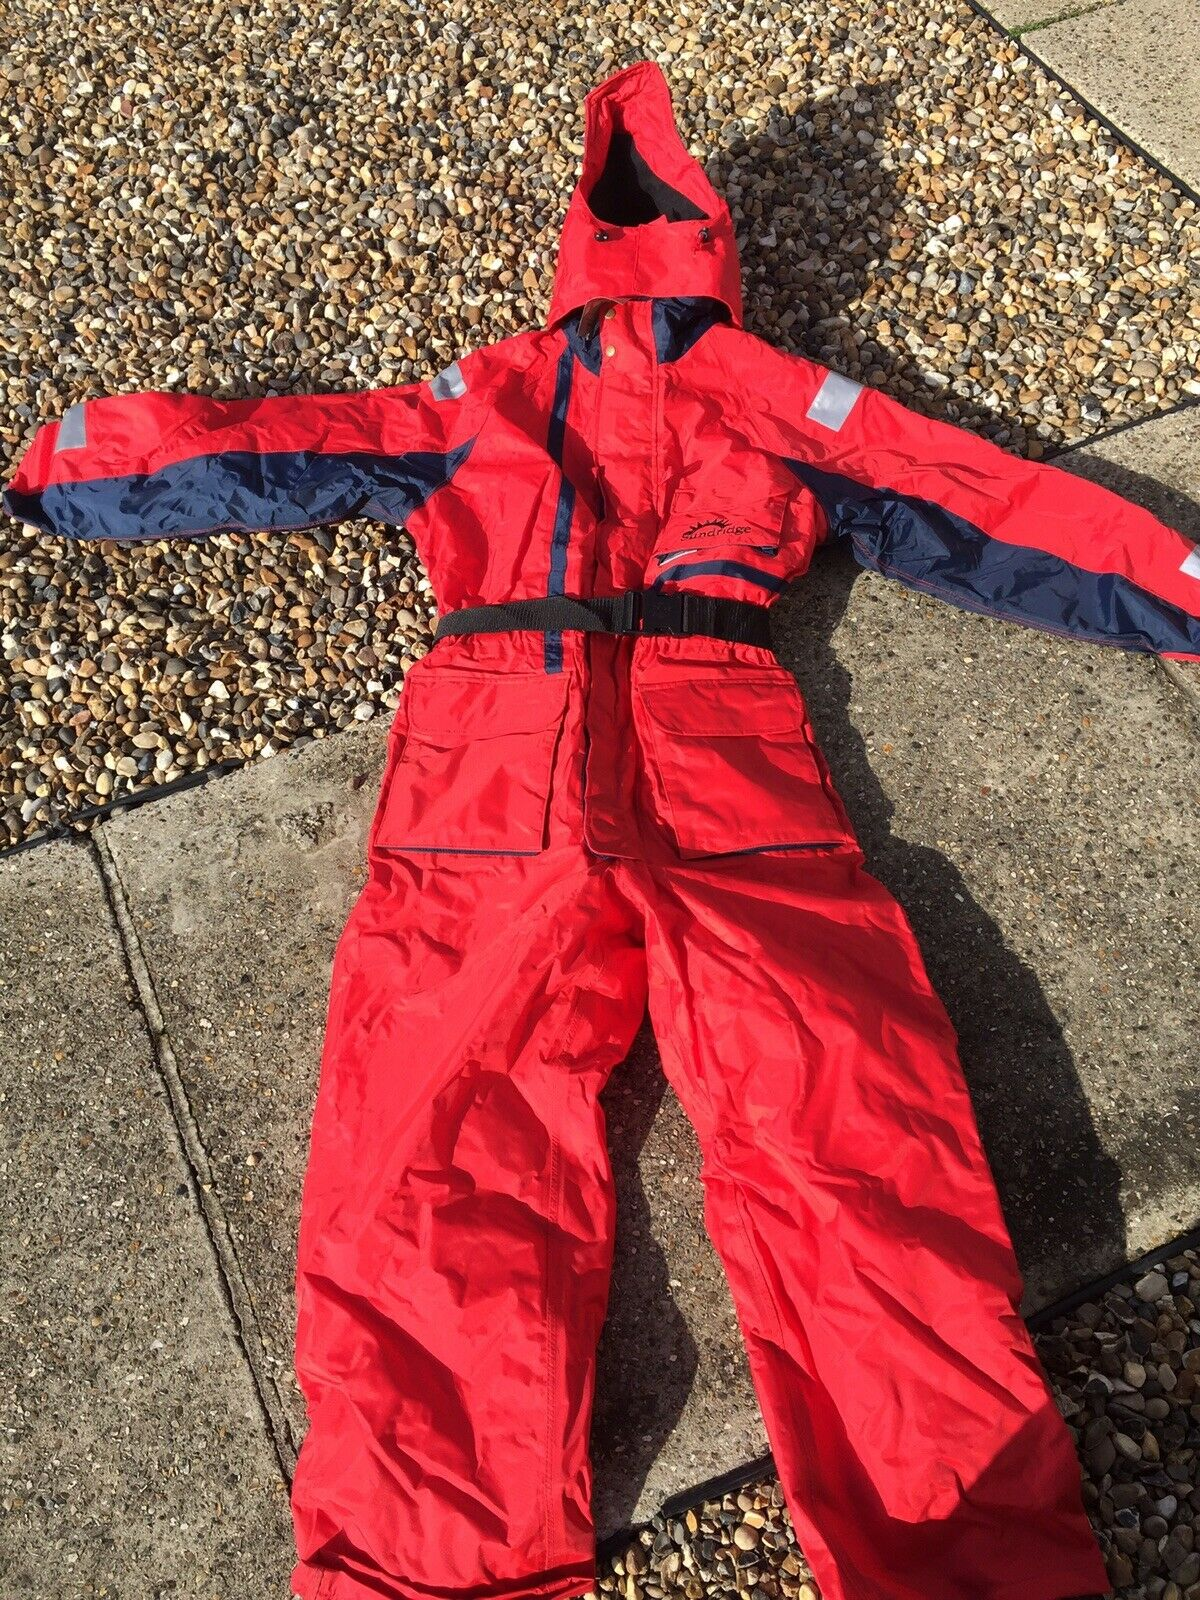 Brand New Sunridge Scotchlite Relfective Buoyancy Aid Suit Floatation Safety Red